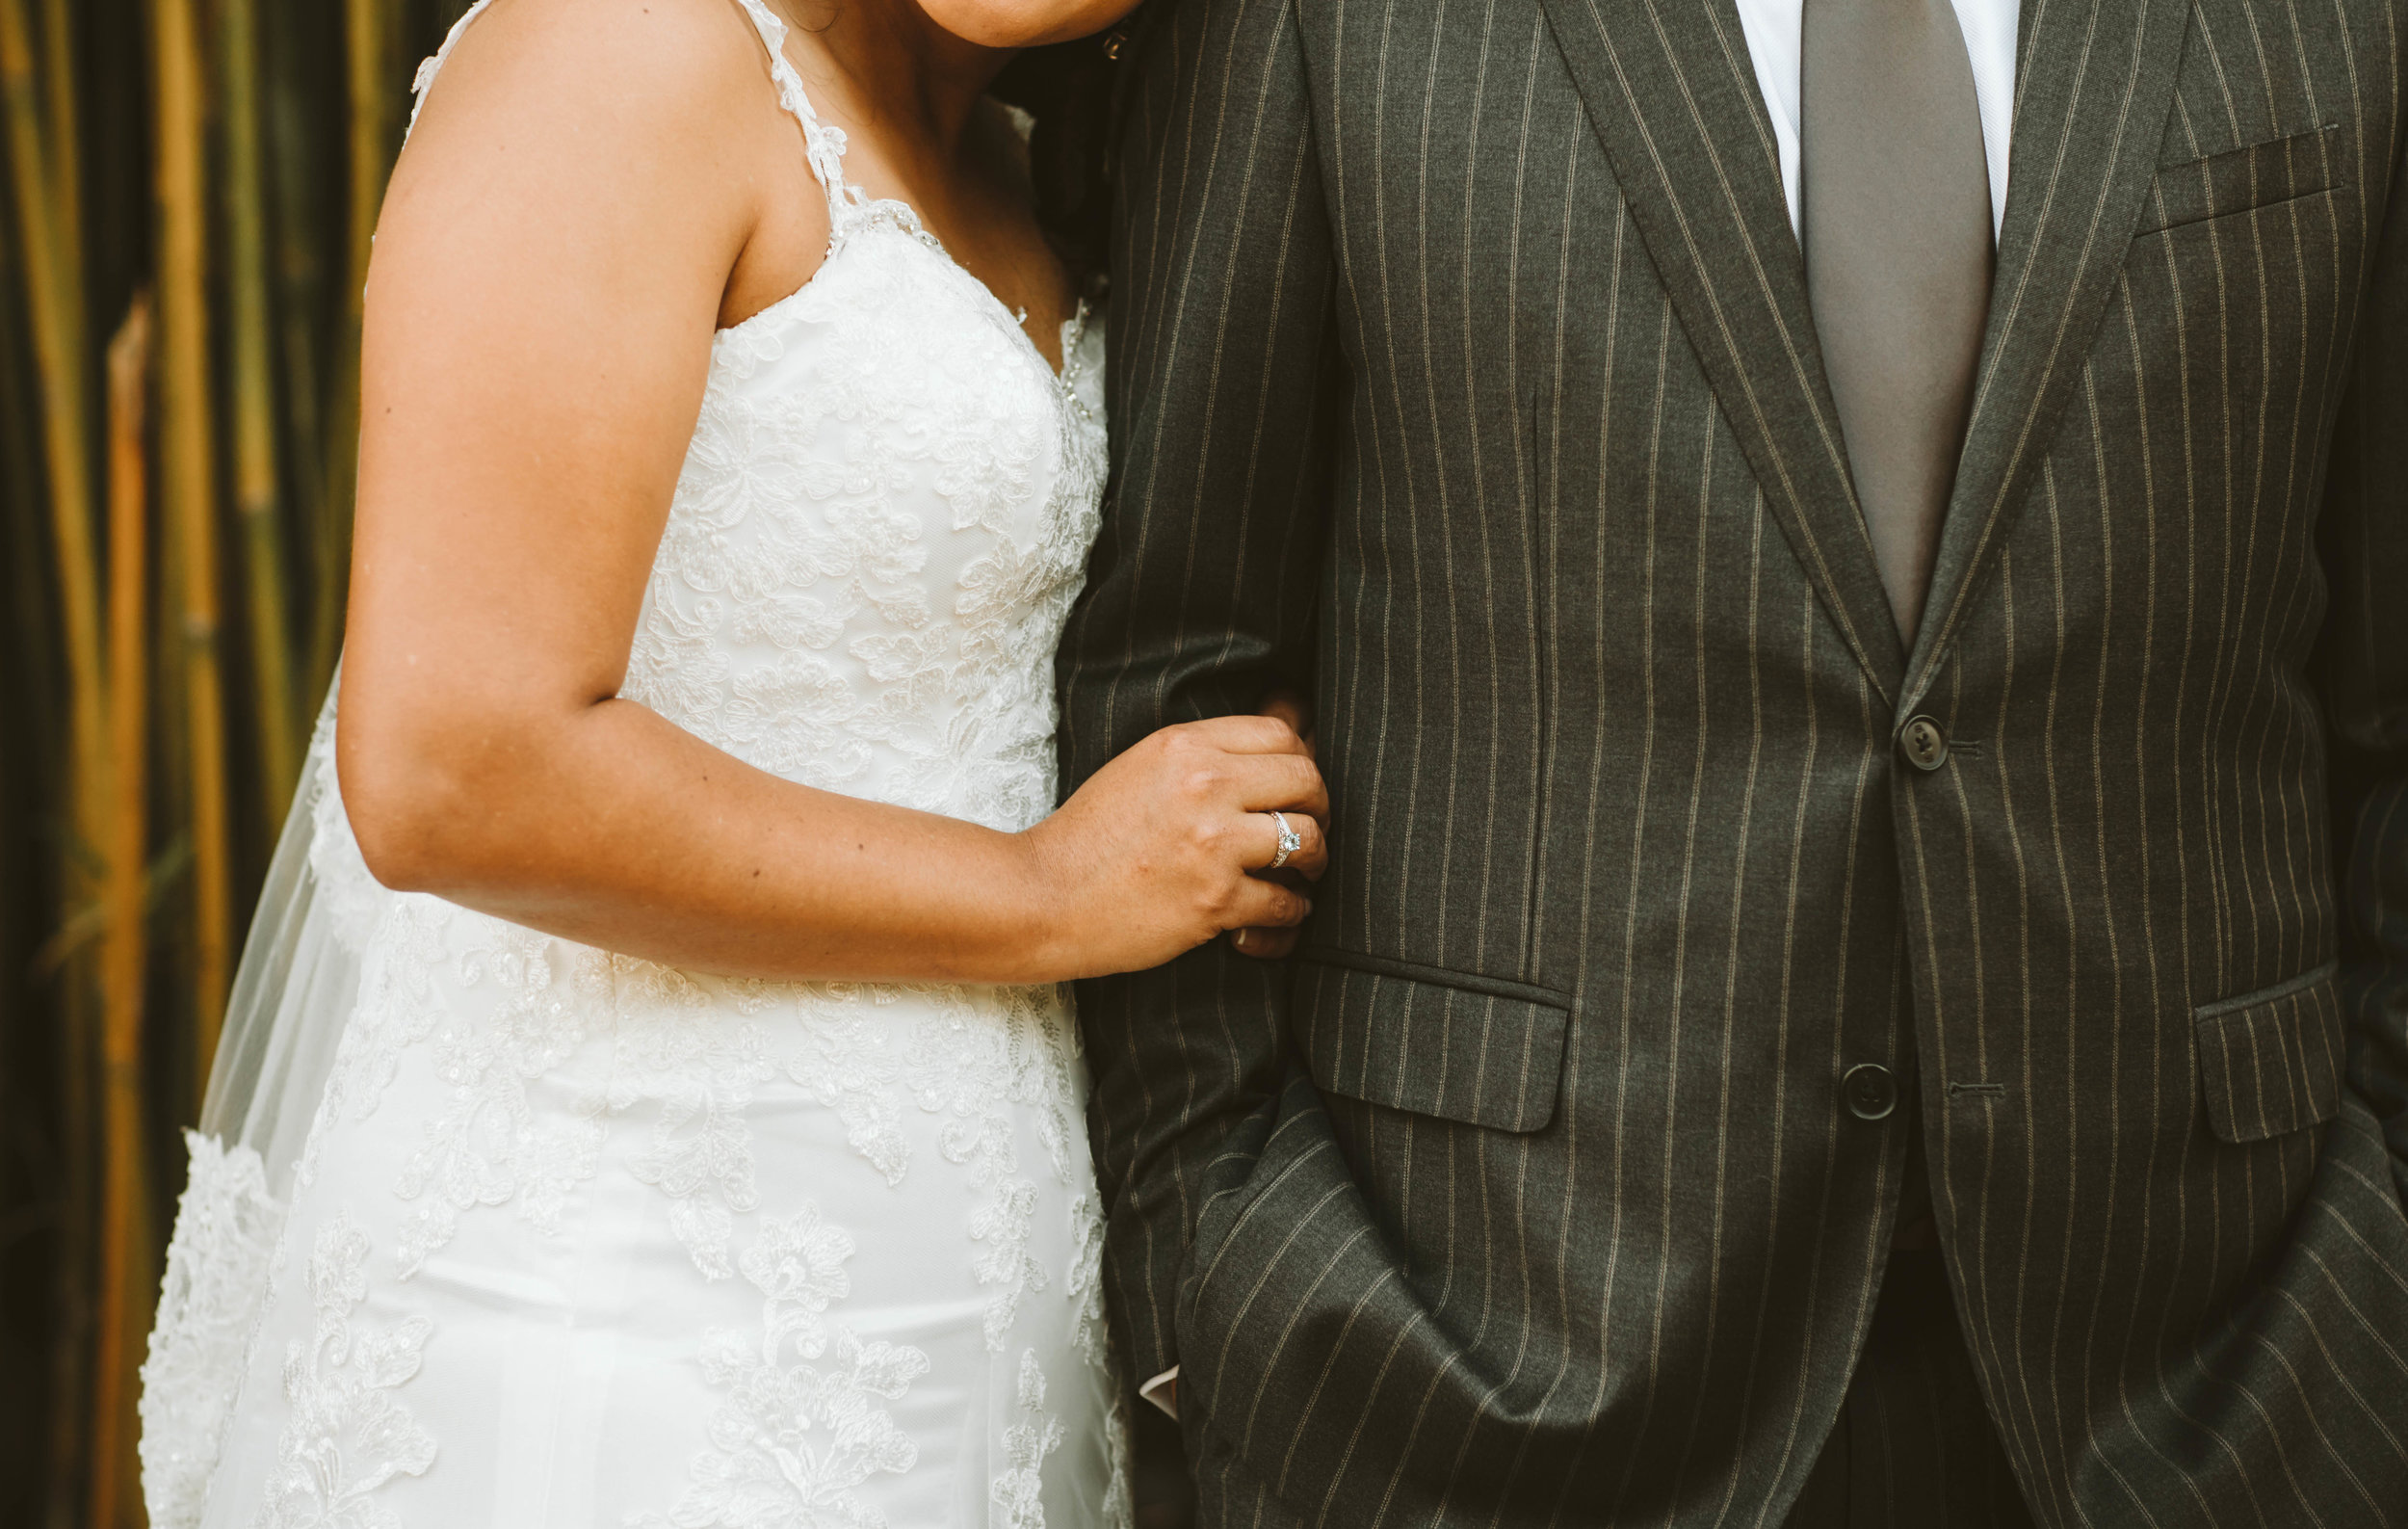 Ian & Juliana - A quaint backyard wedding with those that matter most.